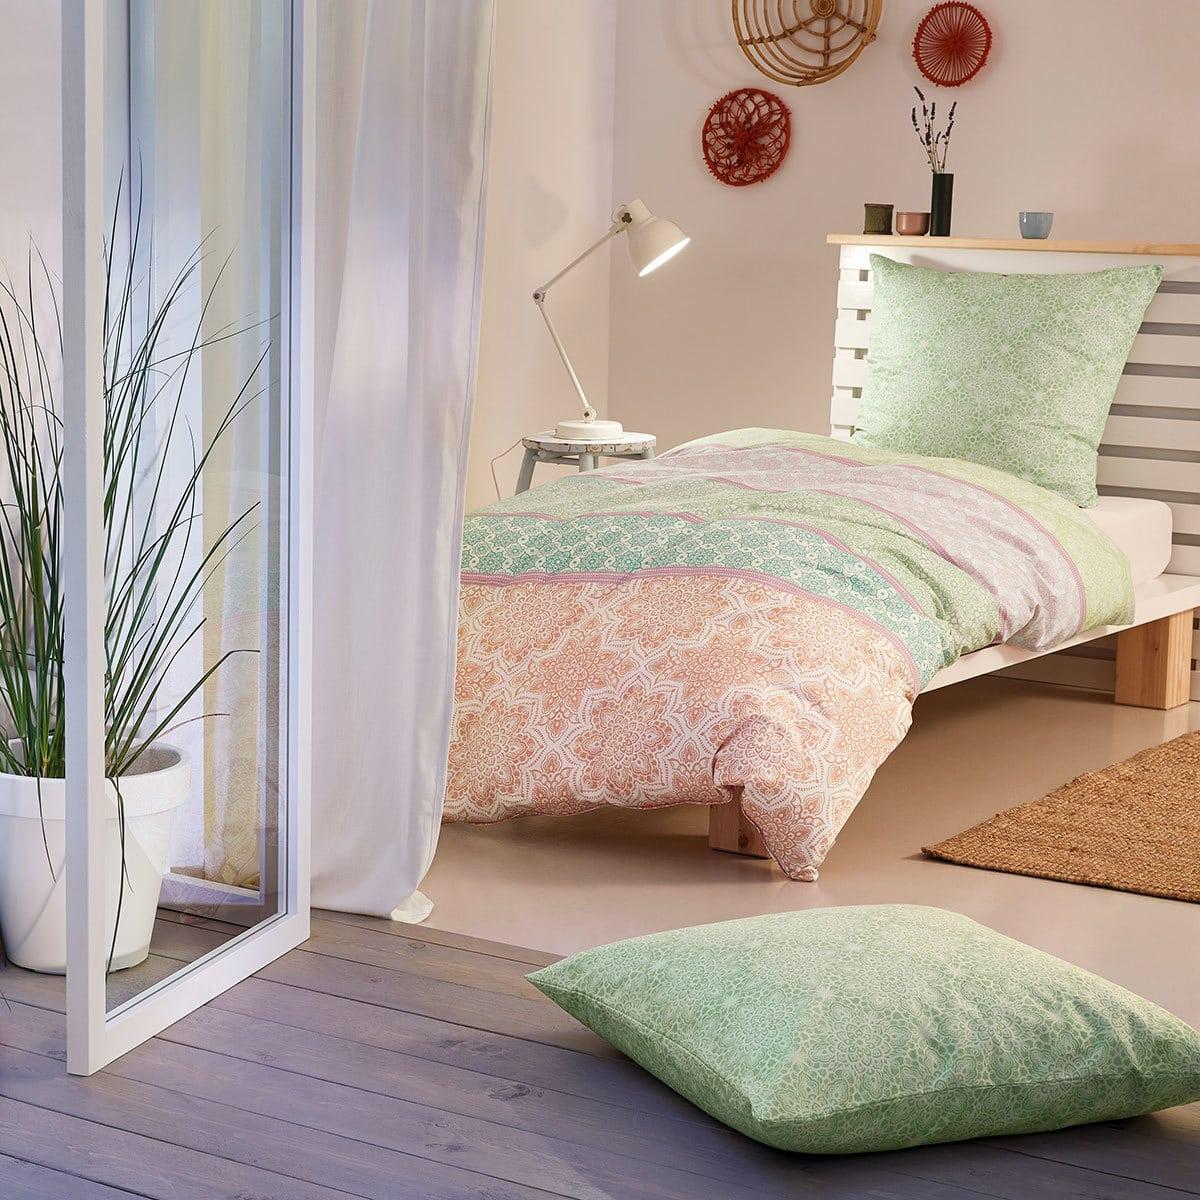 ibena mako satin bettw sche zeitgeist utrecht g nstig. Black Bedroom Furniture Sets. Home Design Ideas